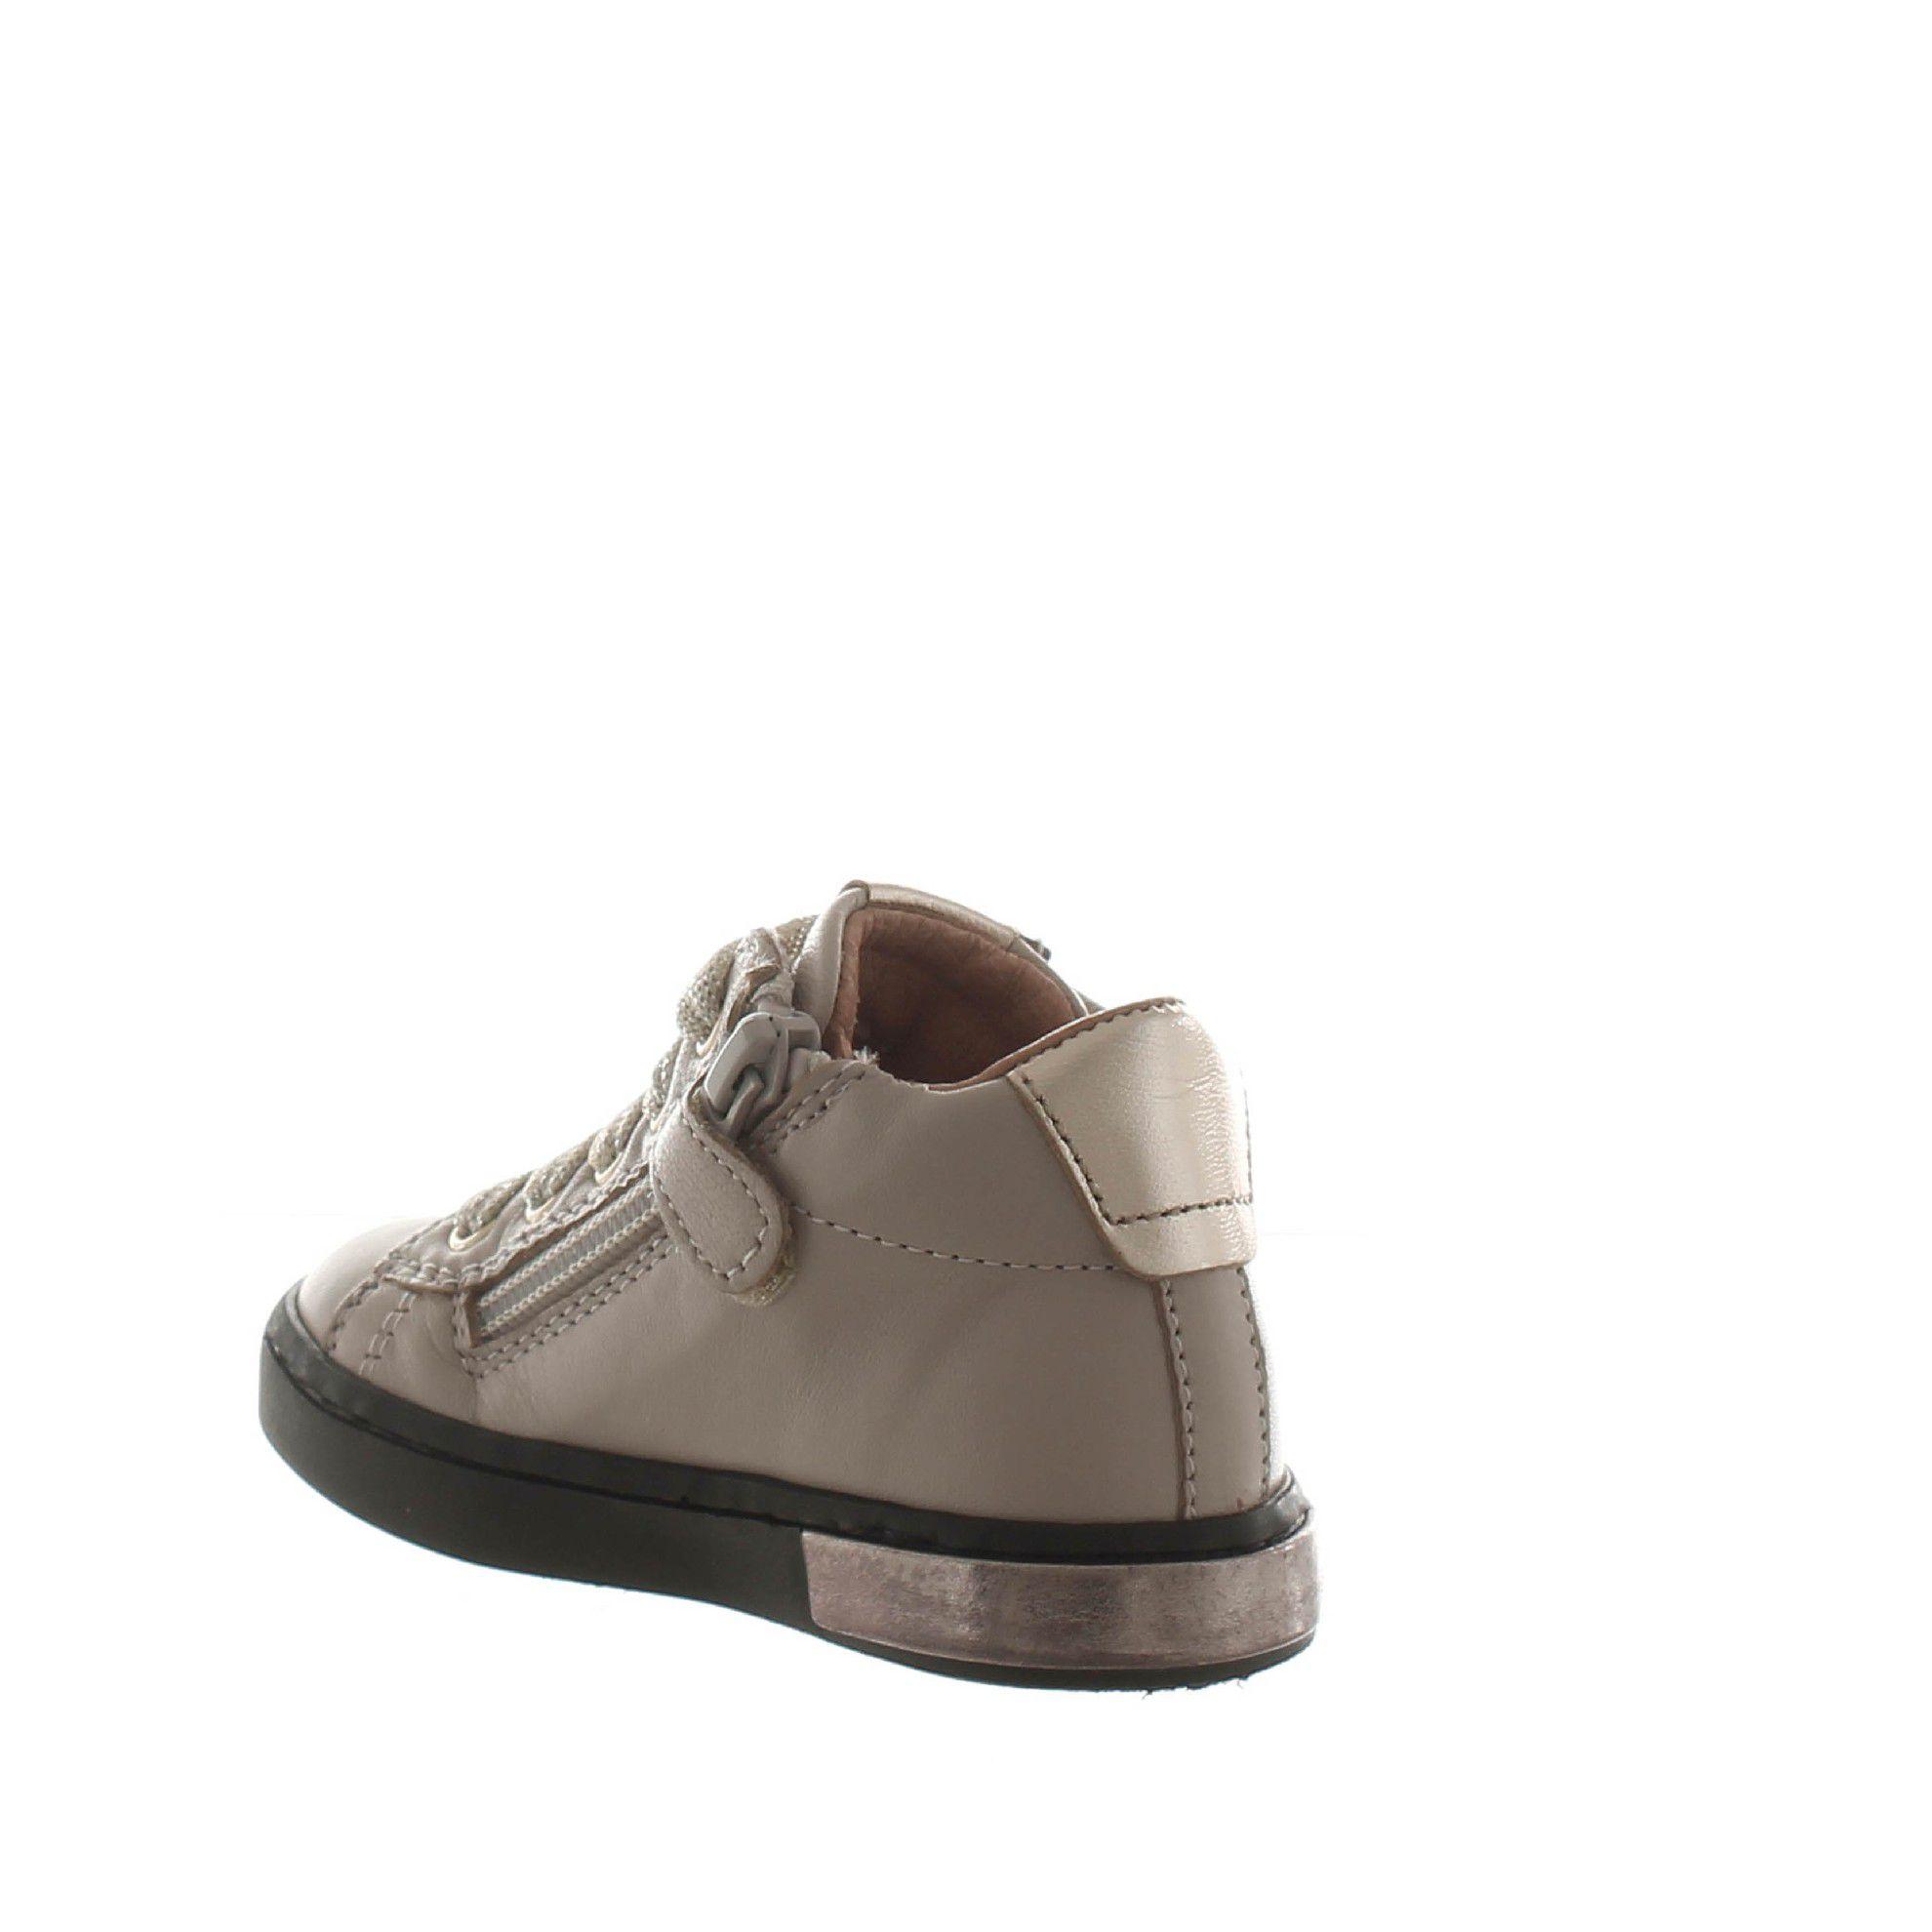 Romagnoli sneaker in pelle e glitter da bambina